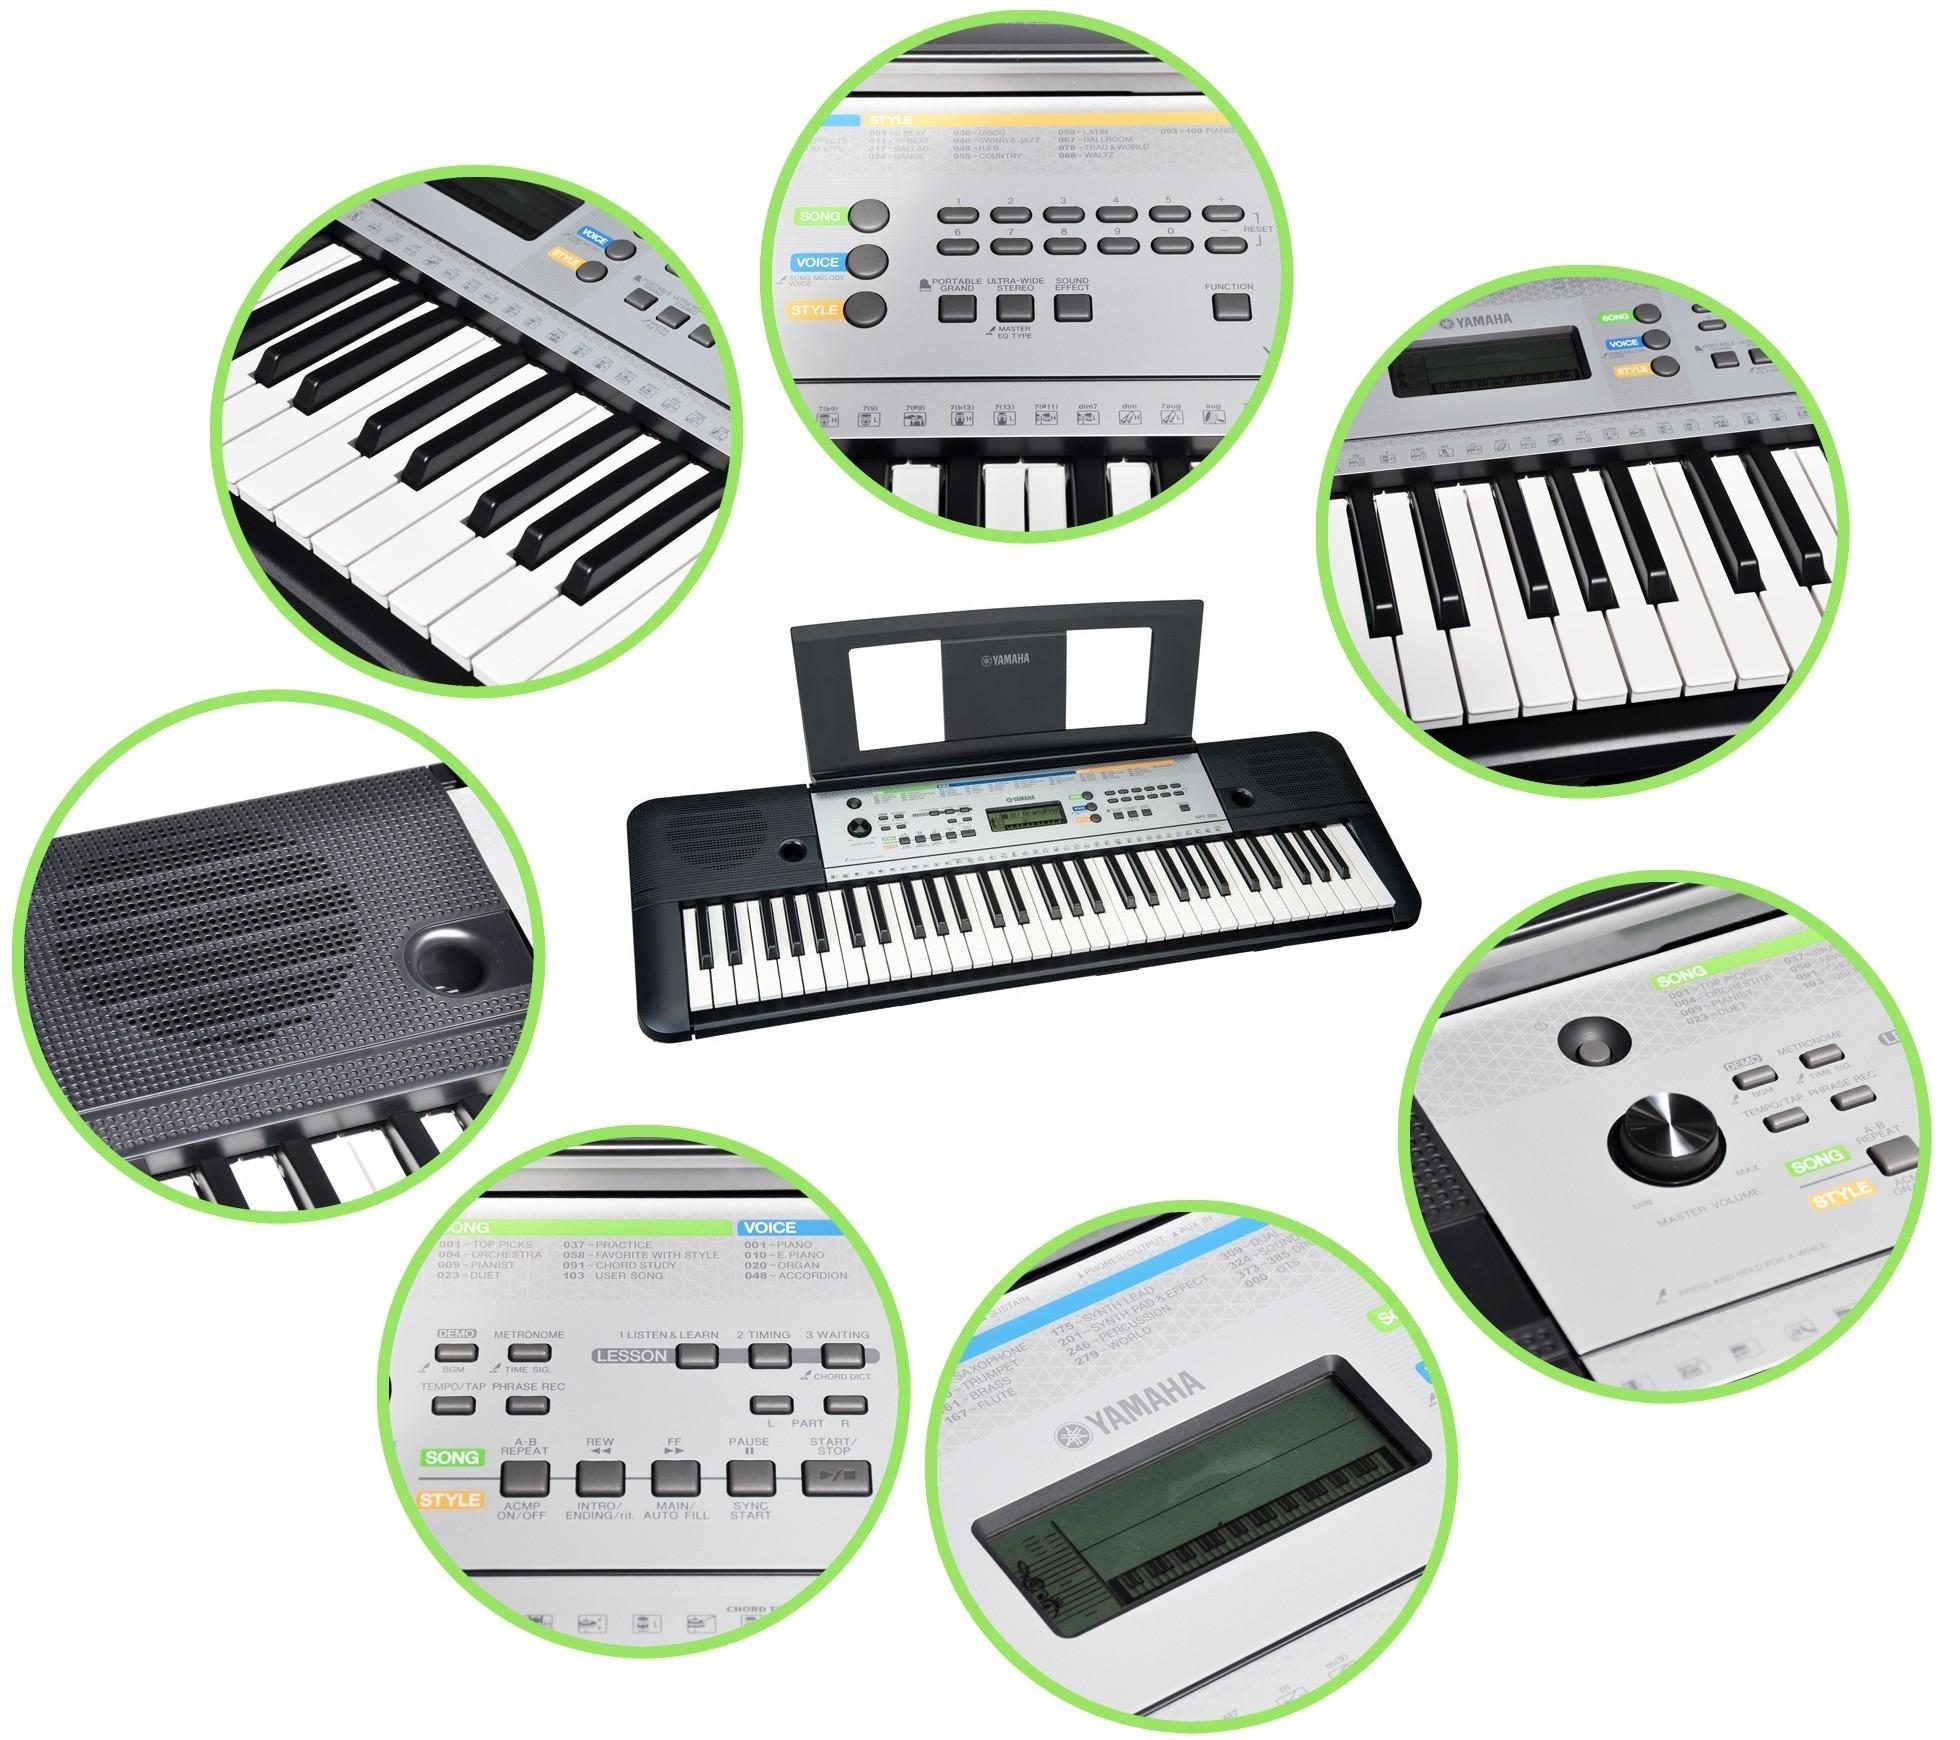 yamaha_ypt_255_keyboard_organ_12.jpg